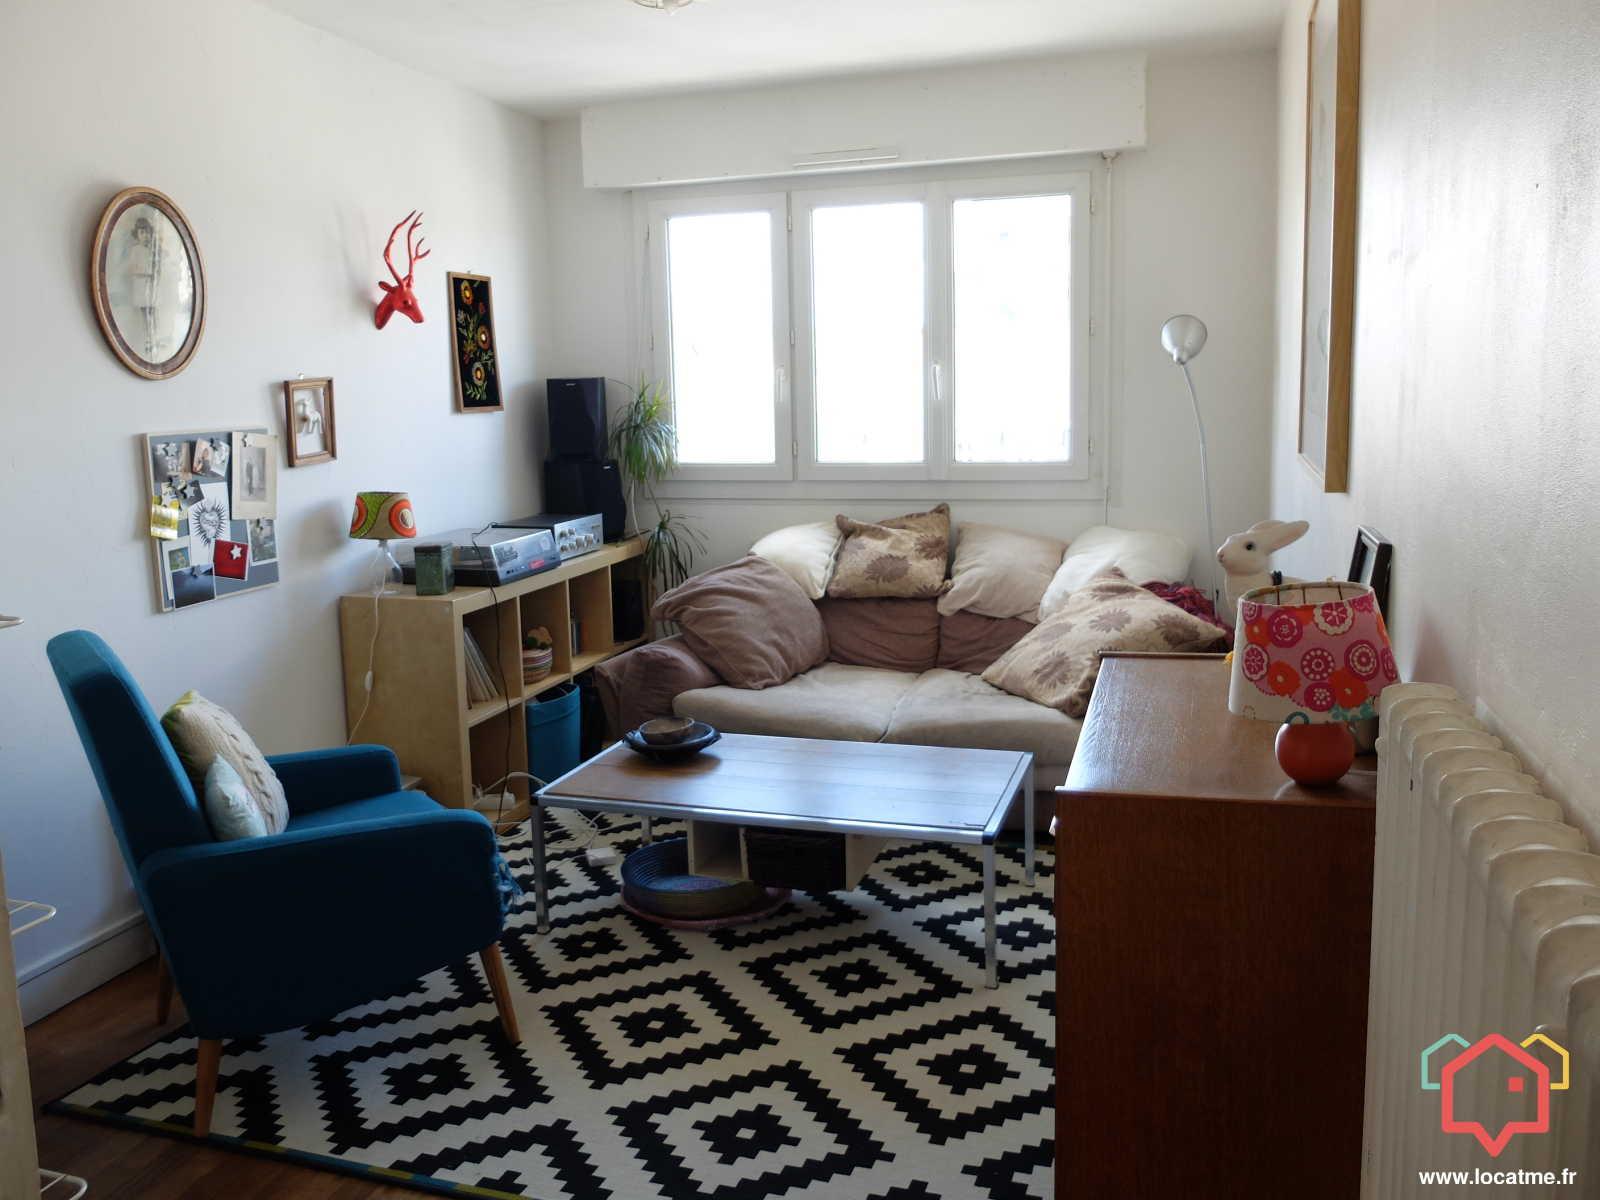 Location Appartement A Rennes Non Meuble Entre Particuliers